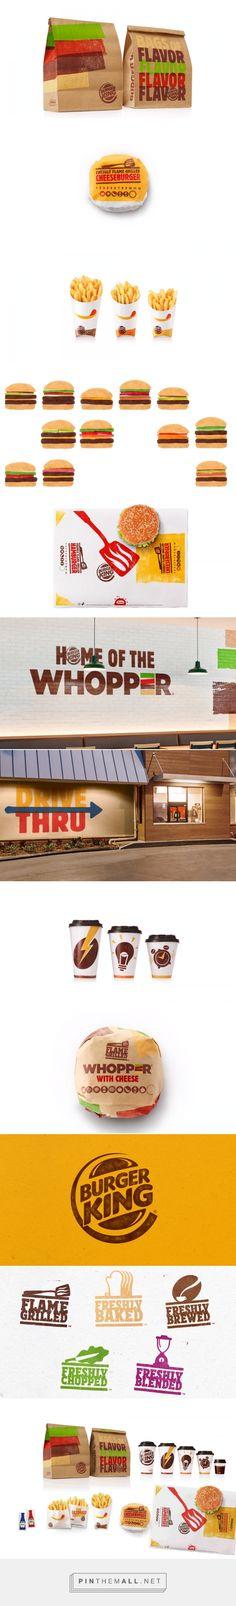 Burger King Rebrand — The Dieline - Branding & Packaging - created via http://pinthemall.net